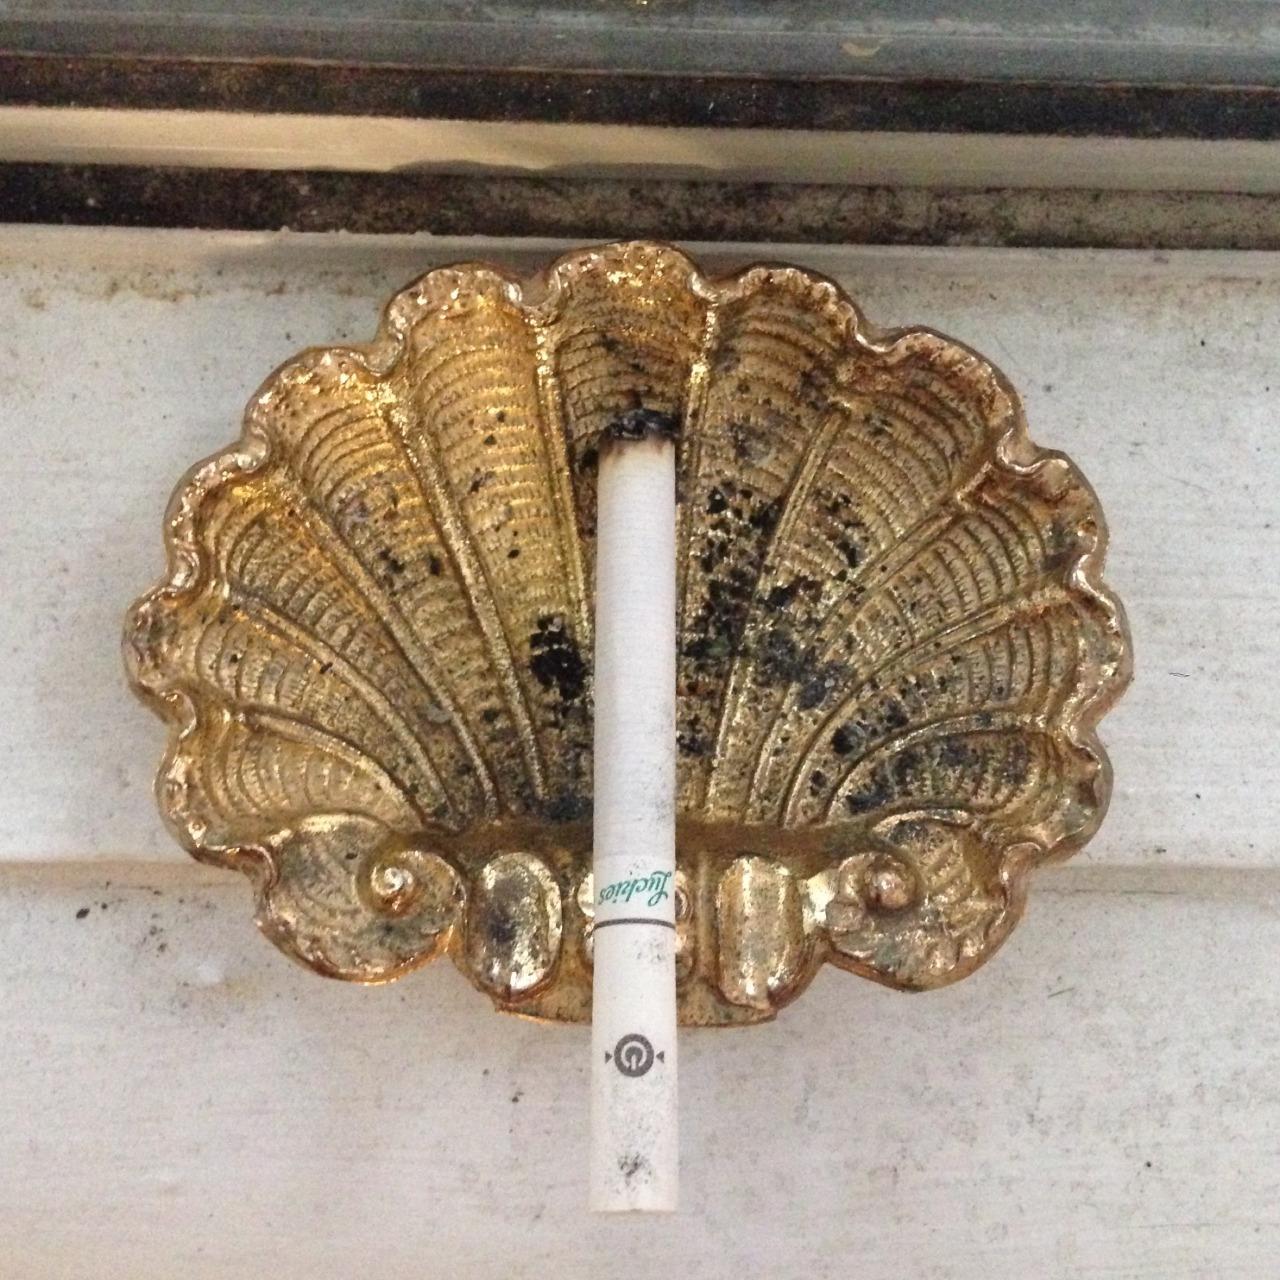 Cigarette on a gold seashell dish. | seashells, cigarette, vintage, decor, inspiration, vintage, baroque, aesthetic | Allegory of Vanity